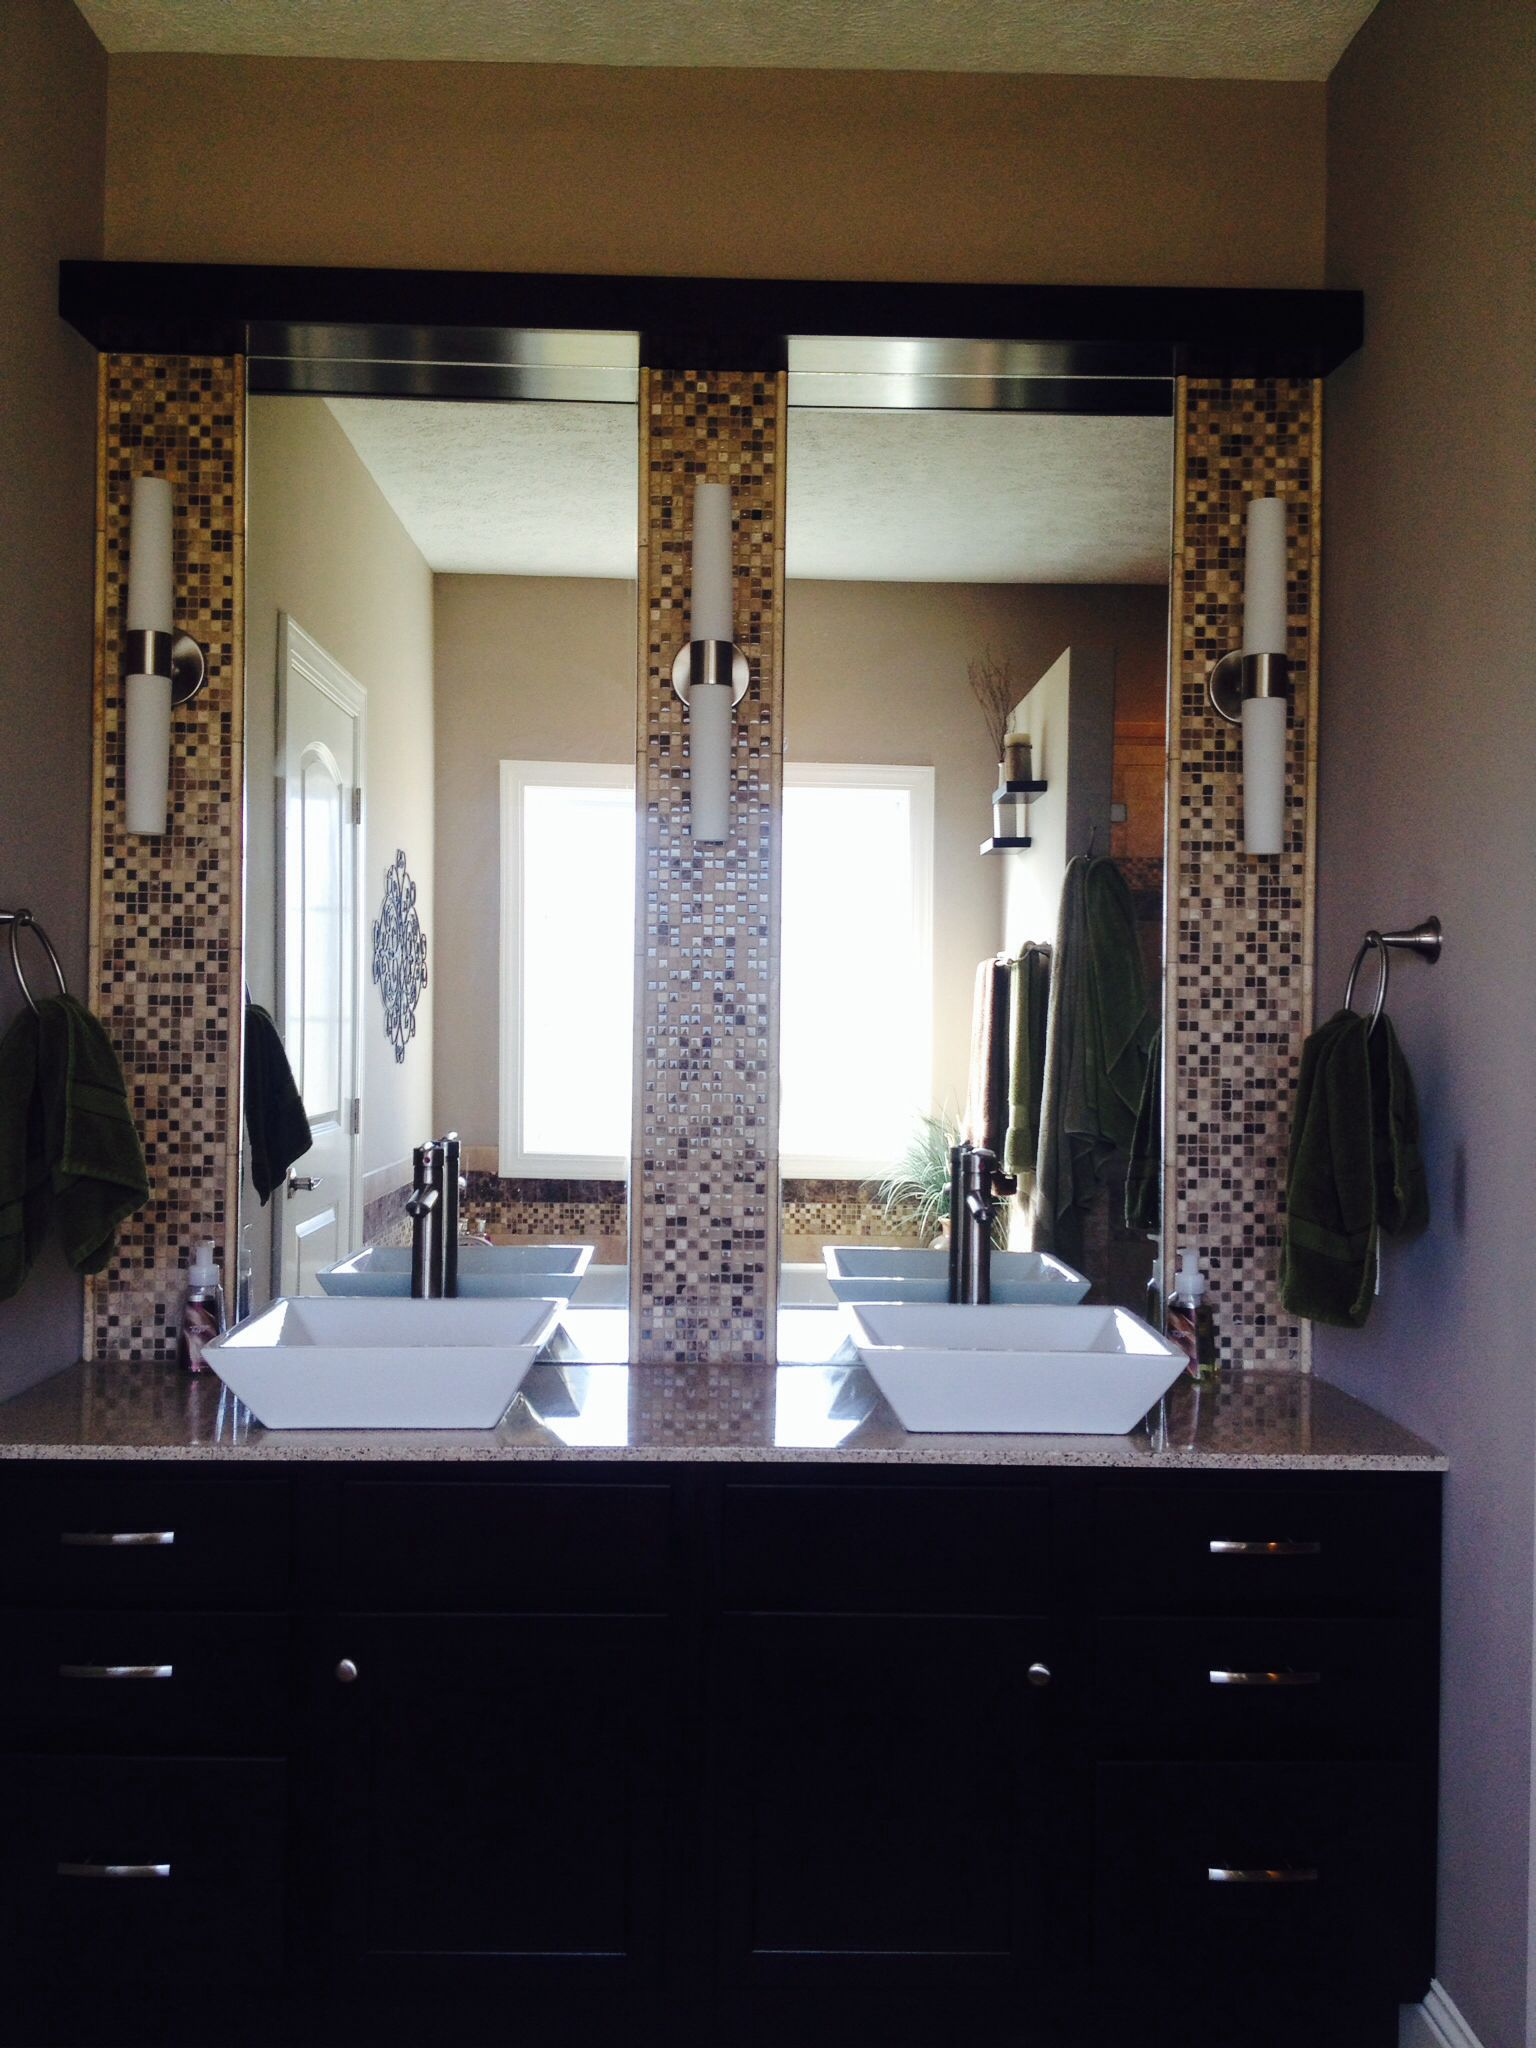 Master Bathroom Vanity Double Sink Double Mirrors